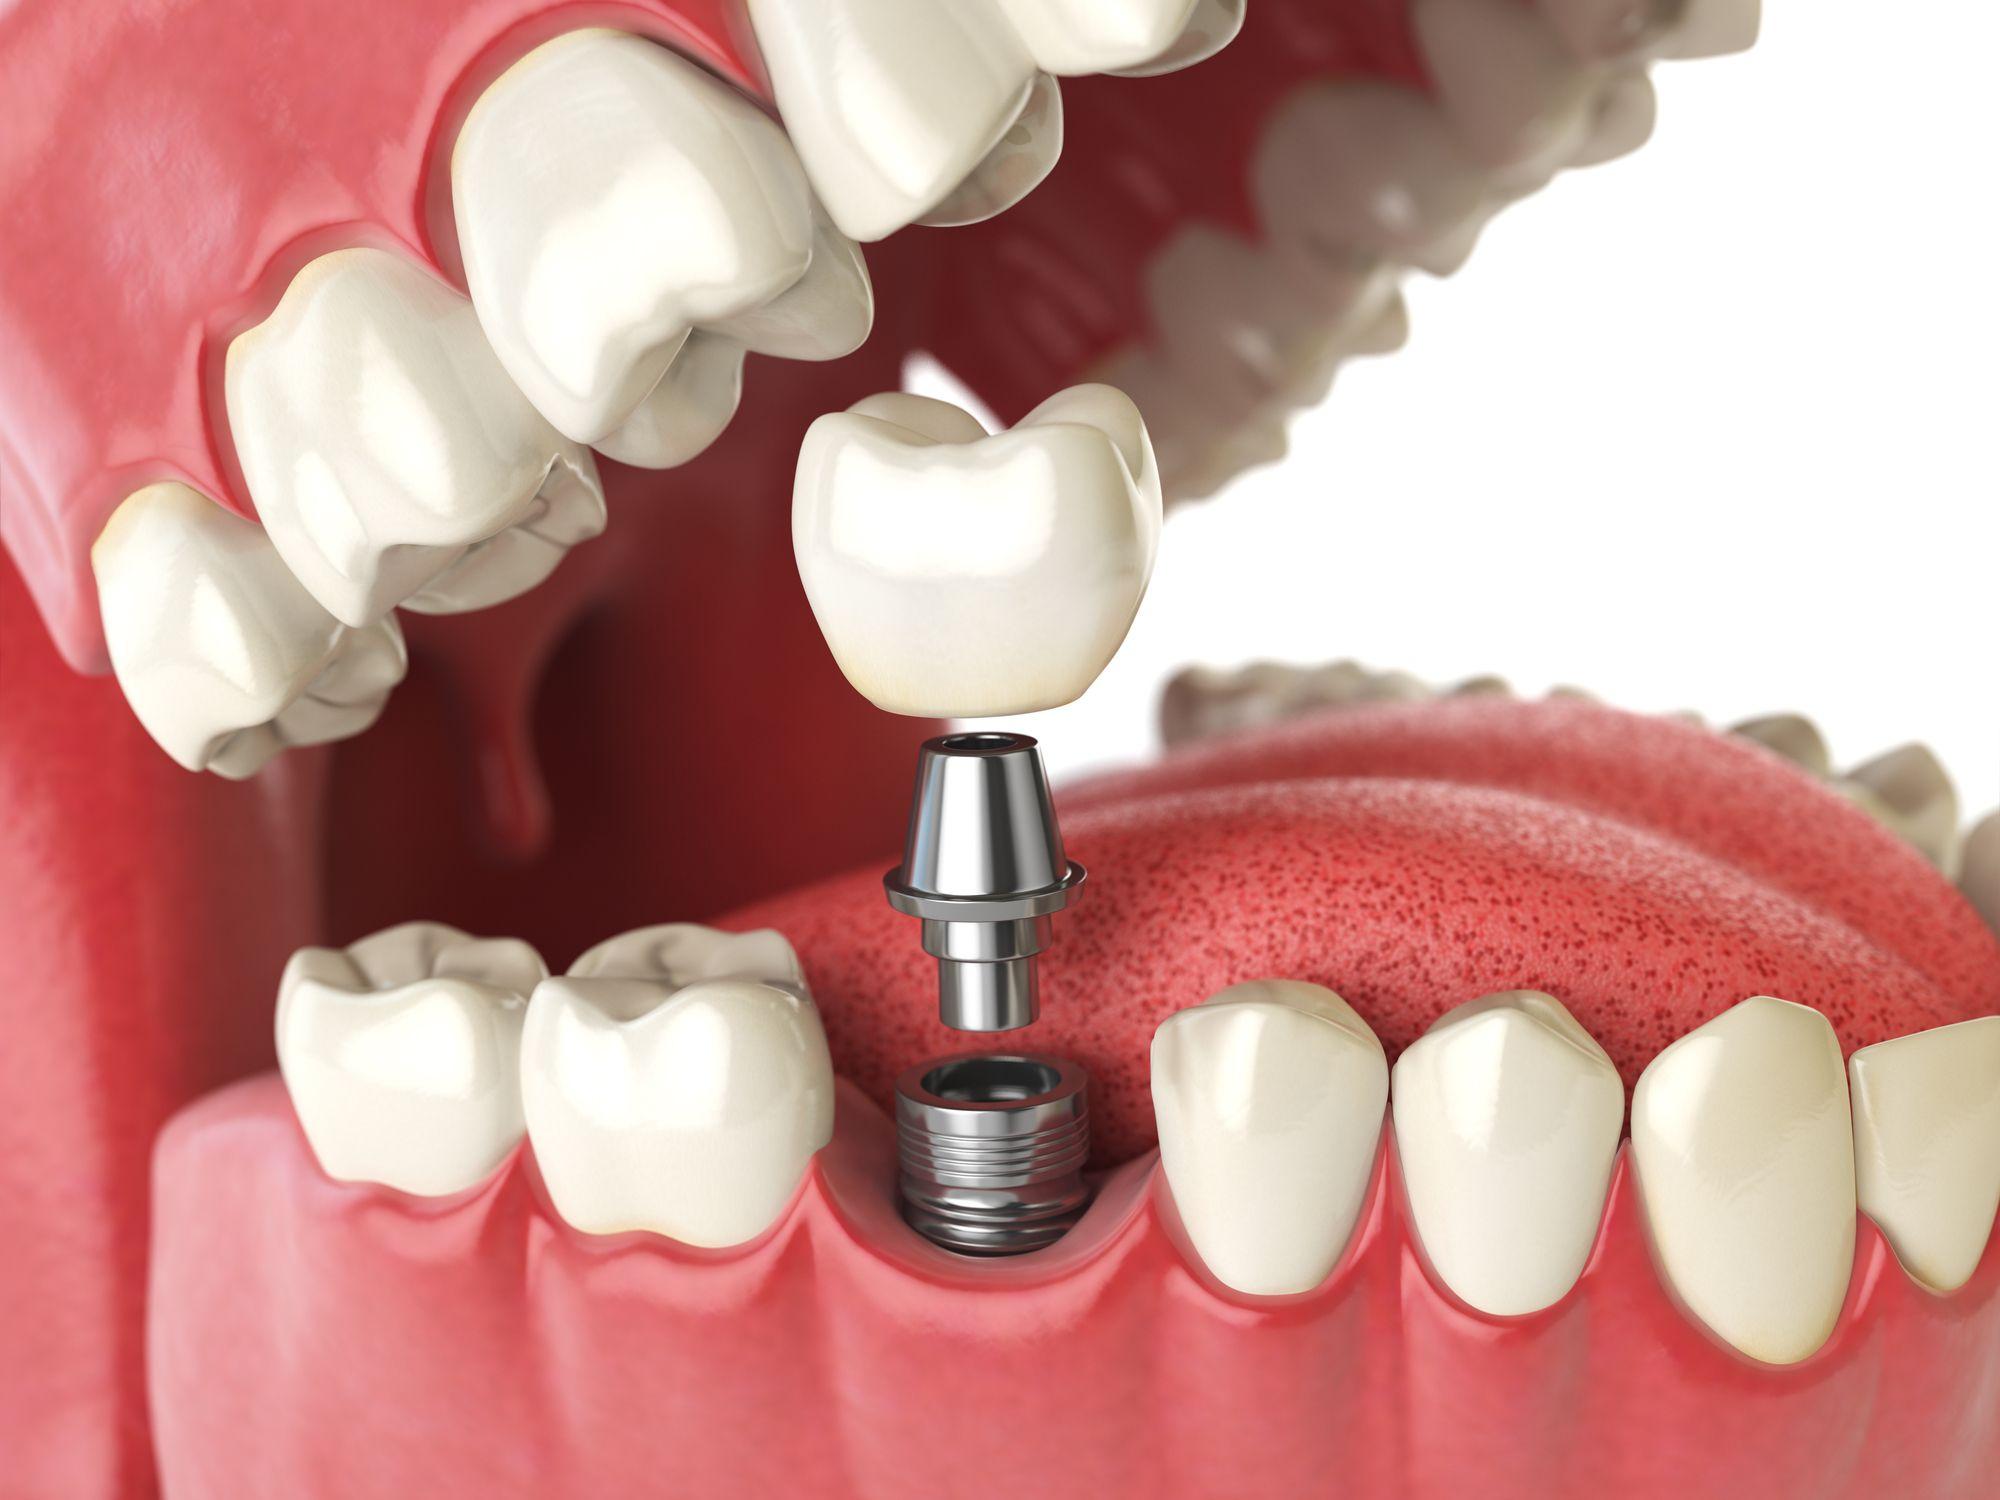 Dental implant healing abutment